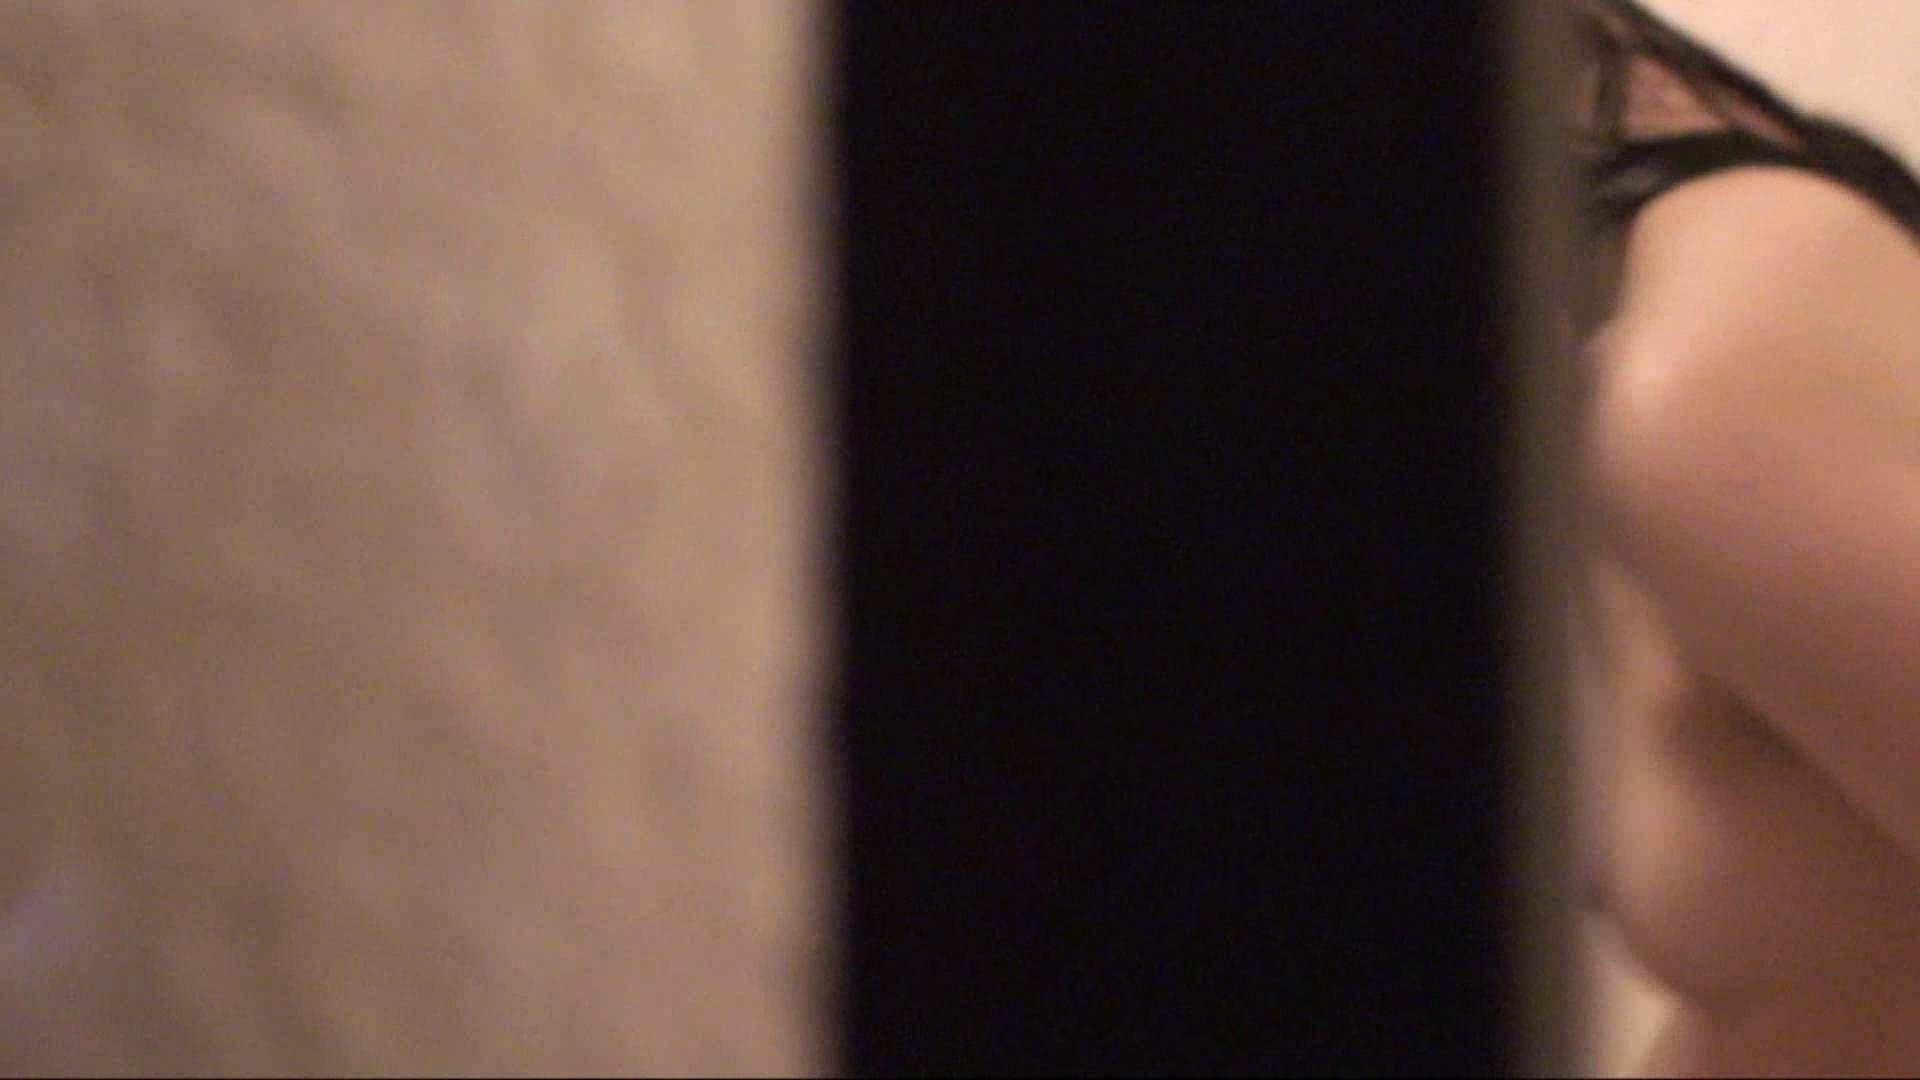 vol.01必見!白肌嬢の乳首が丸見え。極上美人のすっぴん顔をハイビジョンで! 覗き 性交動画流出 71画像 44